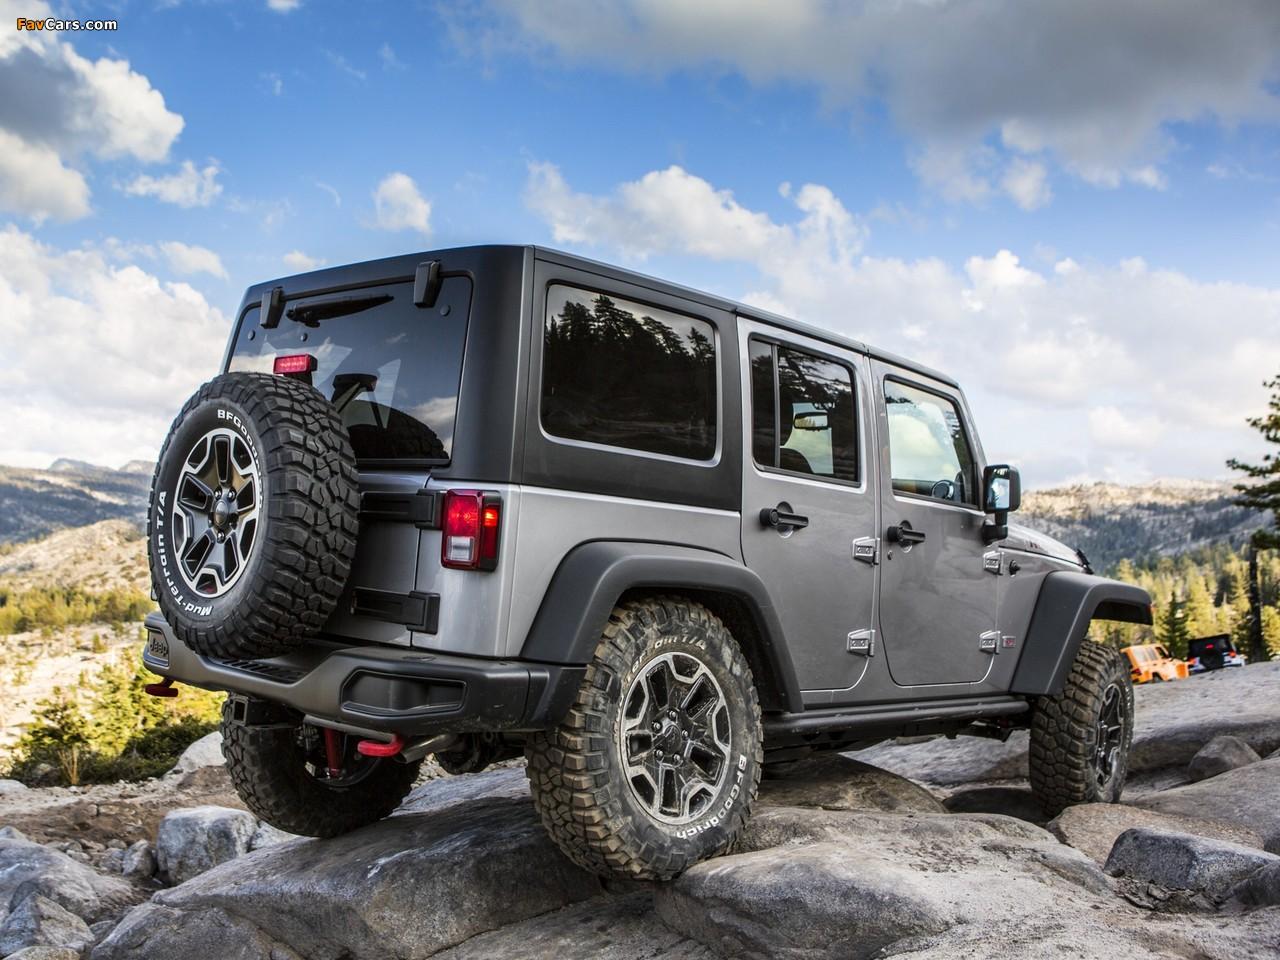 Jeep Wrangler Unlimited Rubicon 10th Anniversary (JK) 2013 photos (1280 x 960)